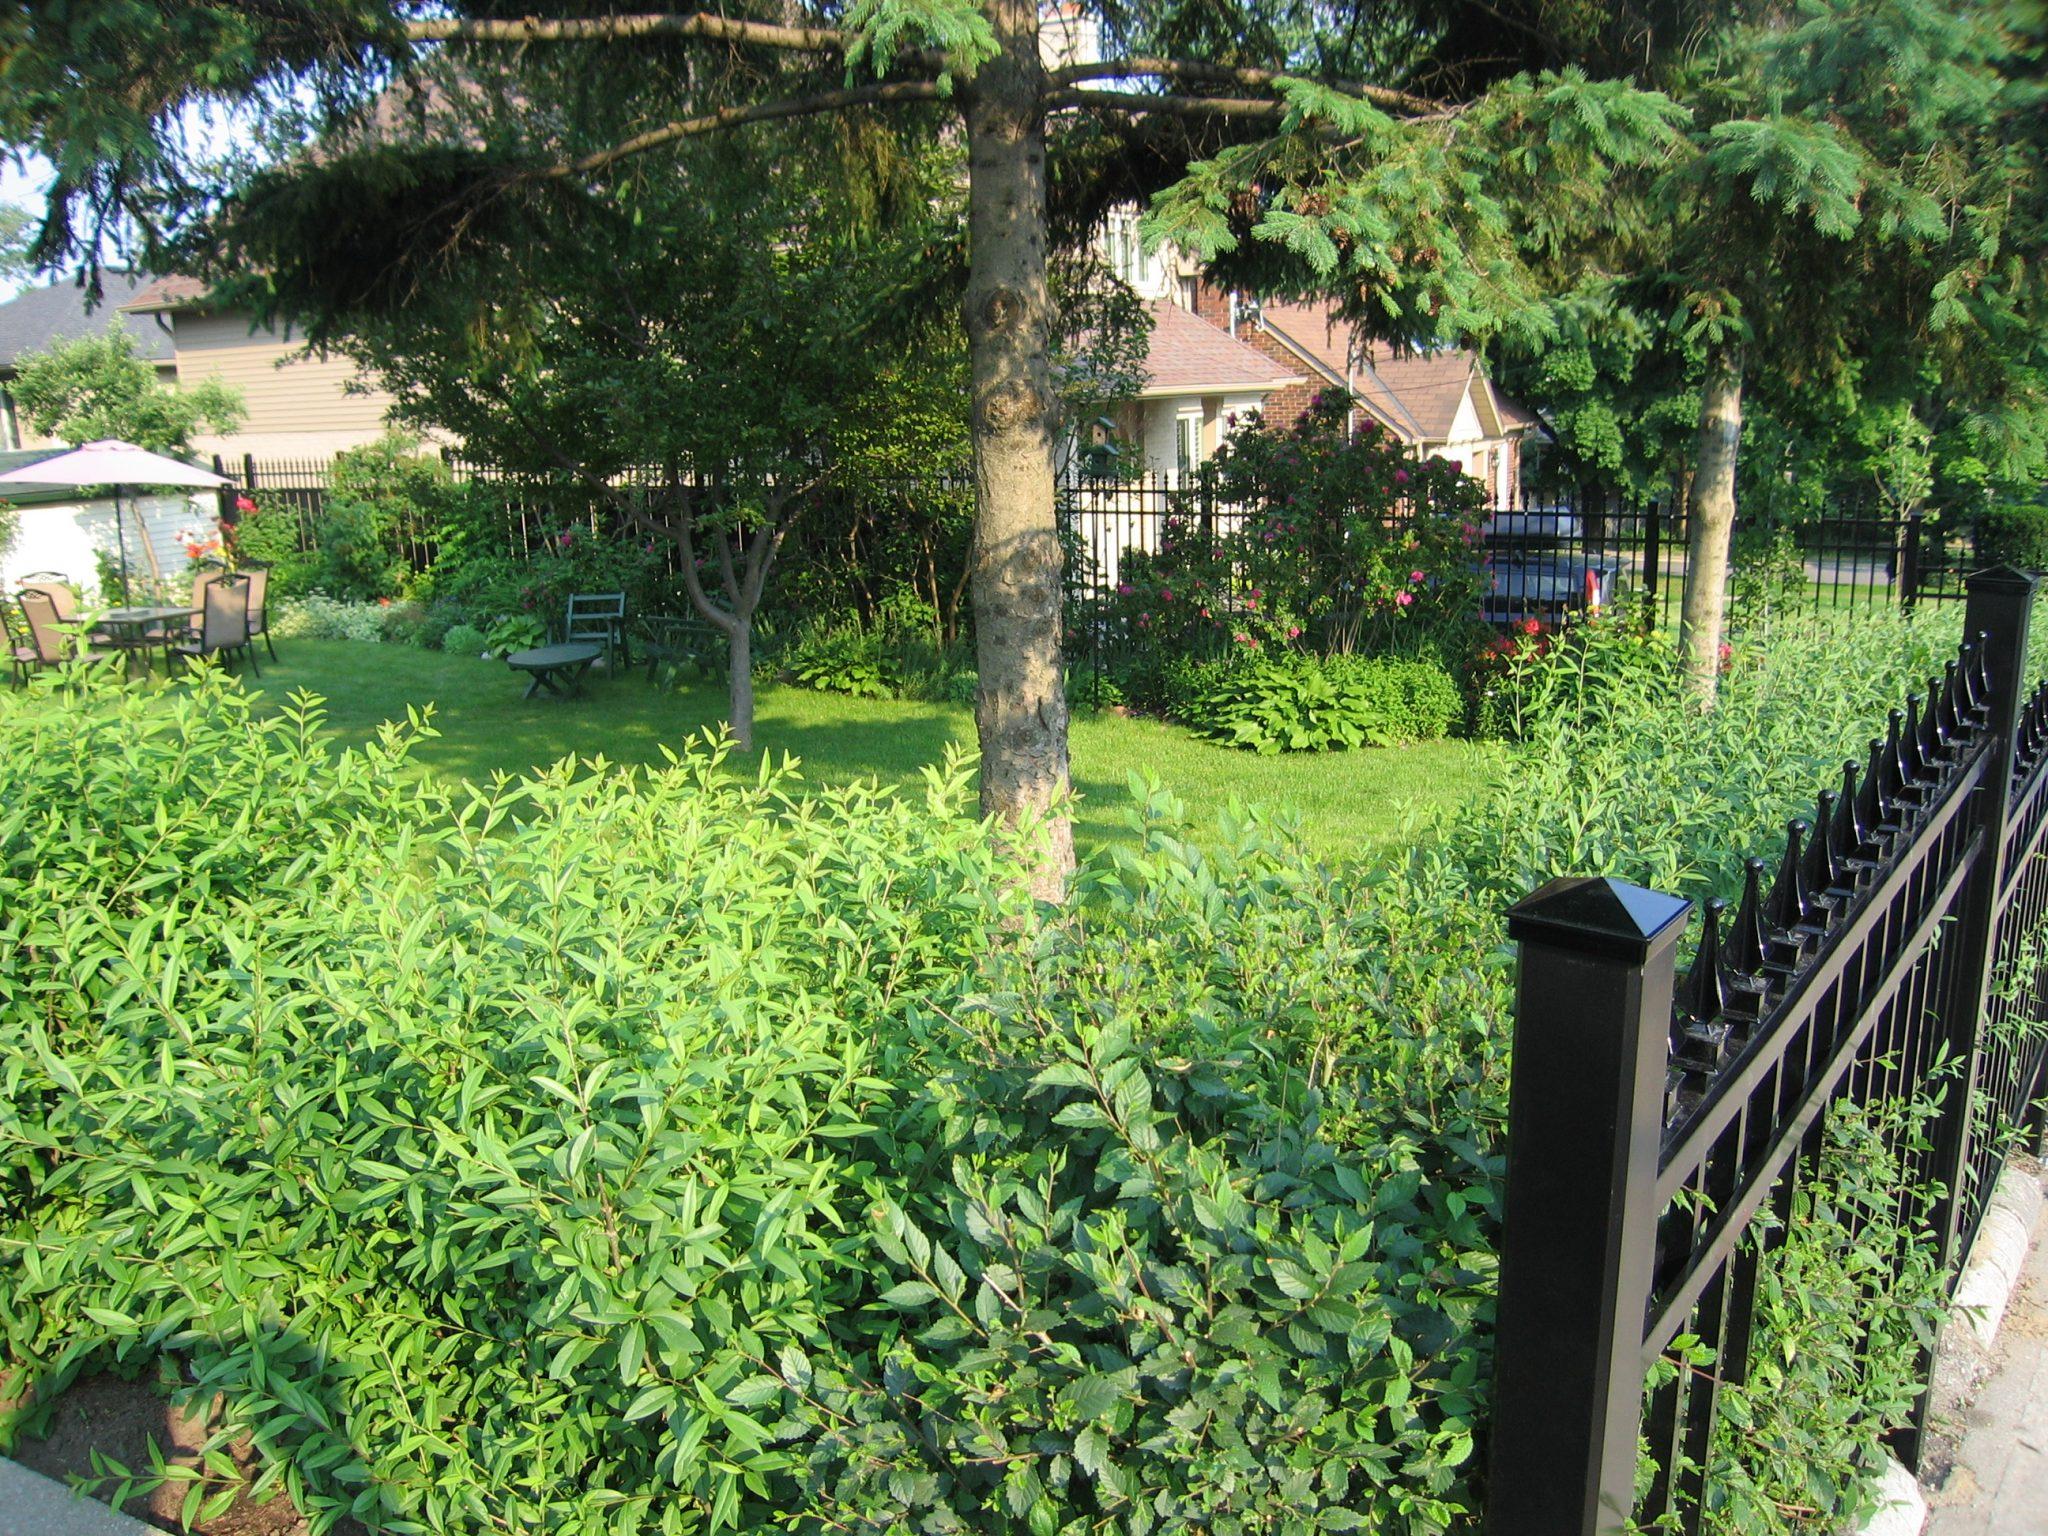 (30) Pickets encasing bushes in yard